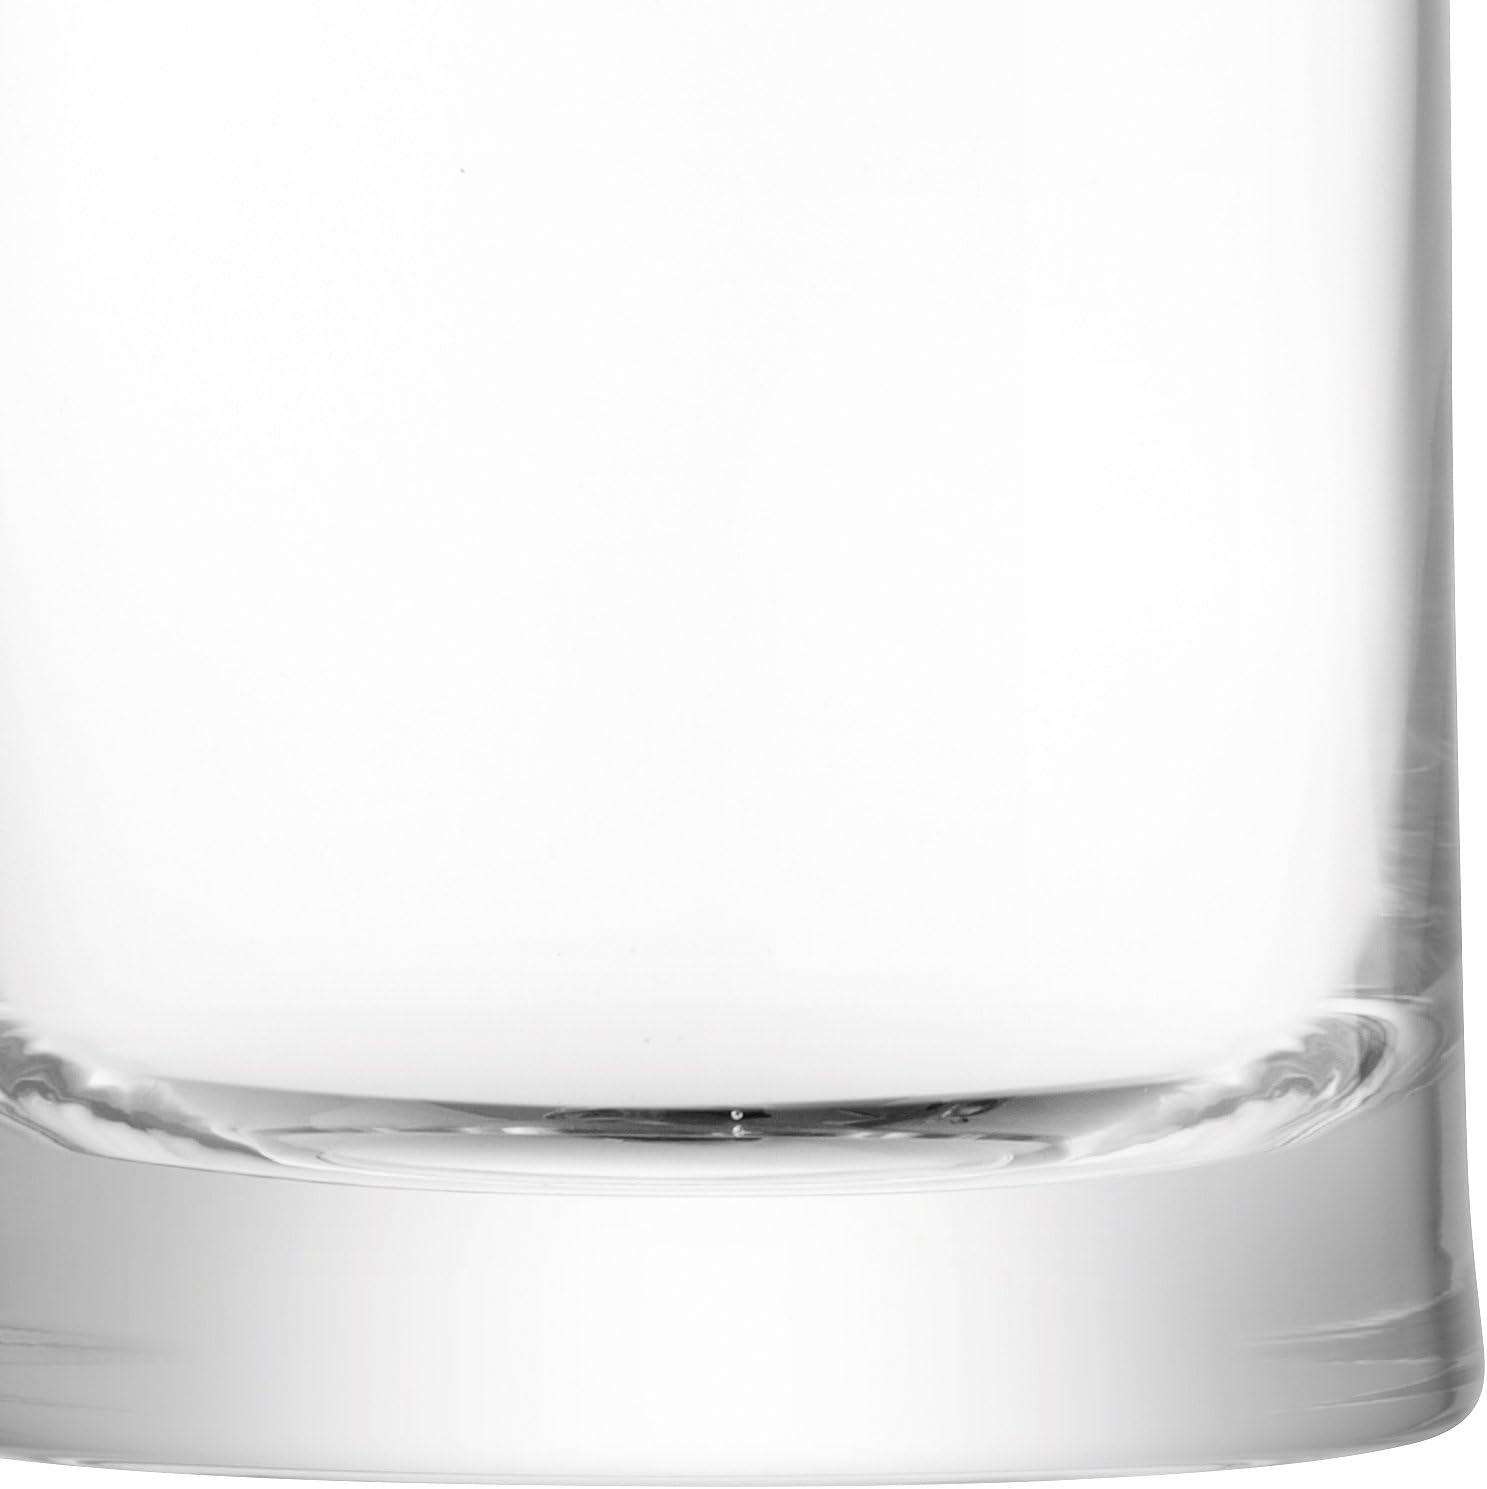 LSA International Gin Zahnputzbecher 310/ml transparent X 2 Set von 2